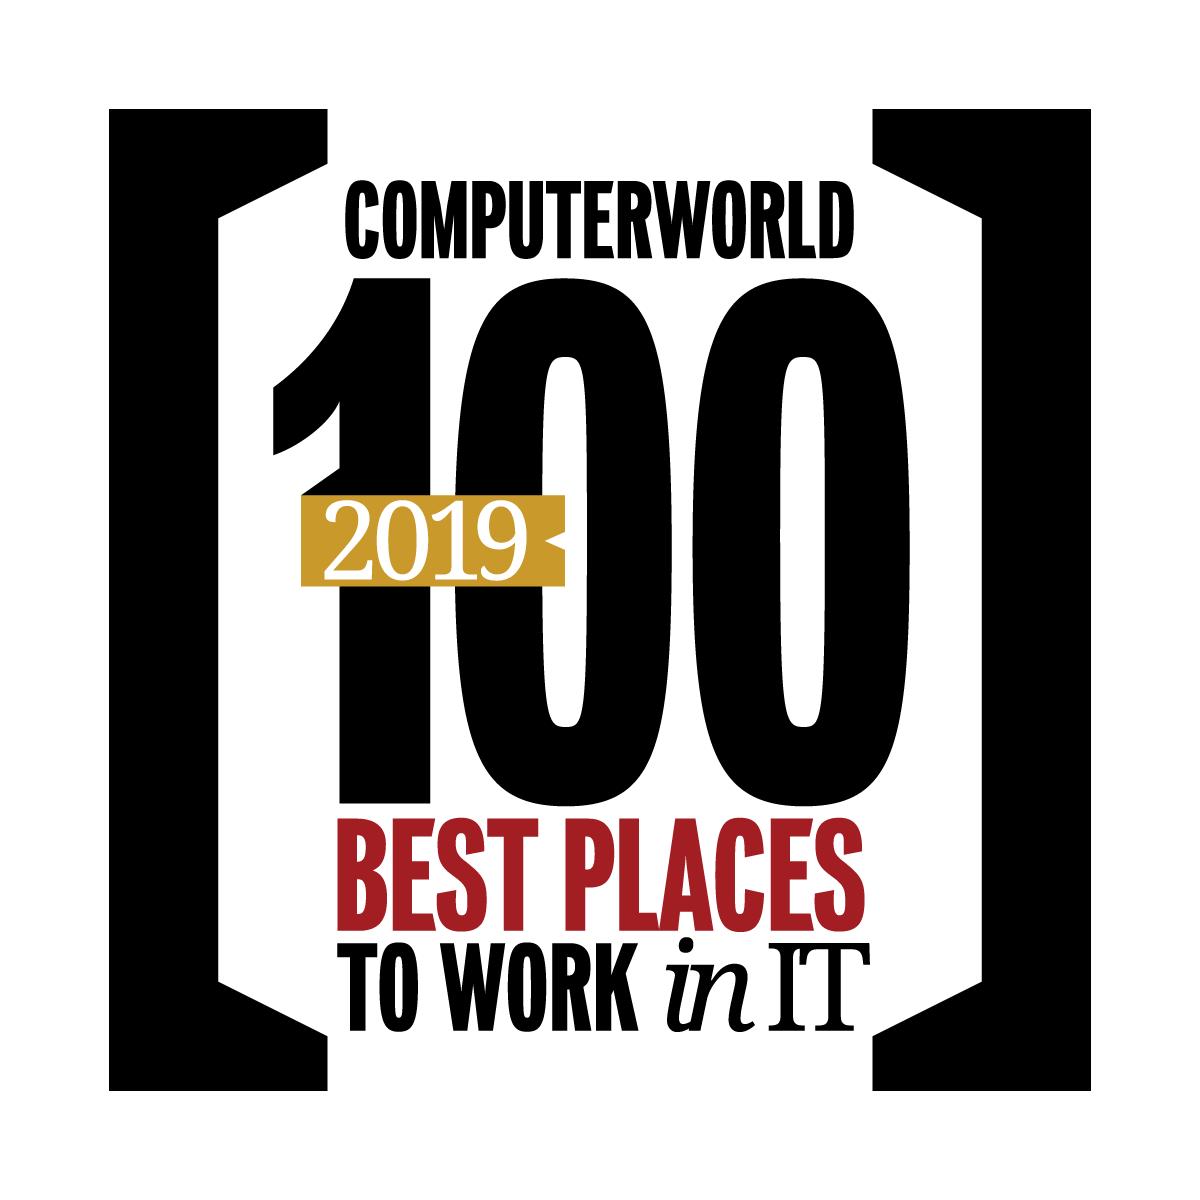 ComputerWorld 19